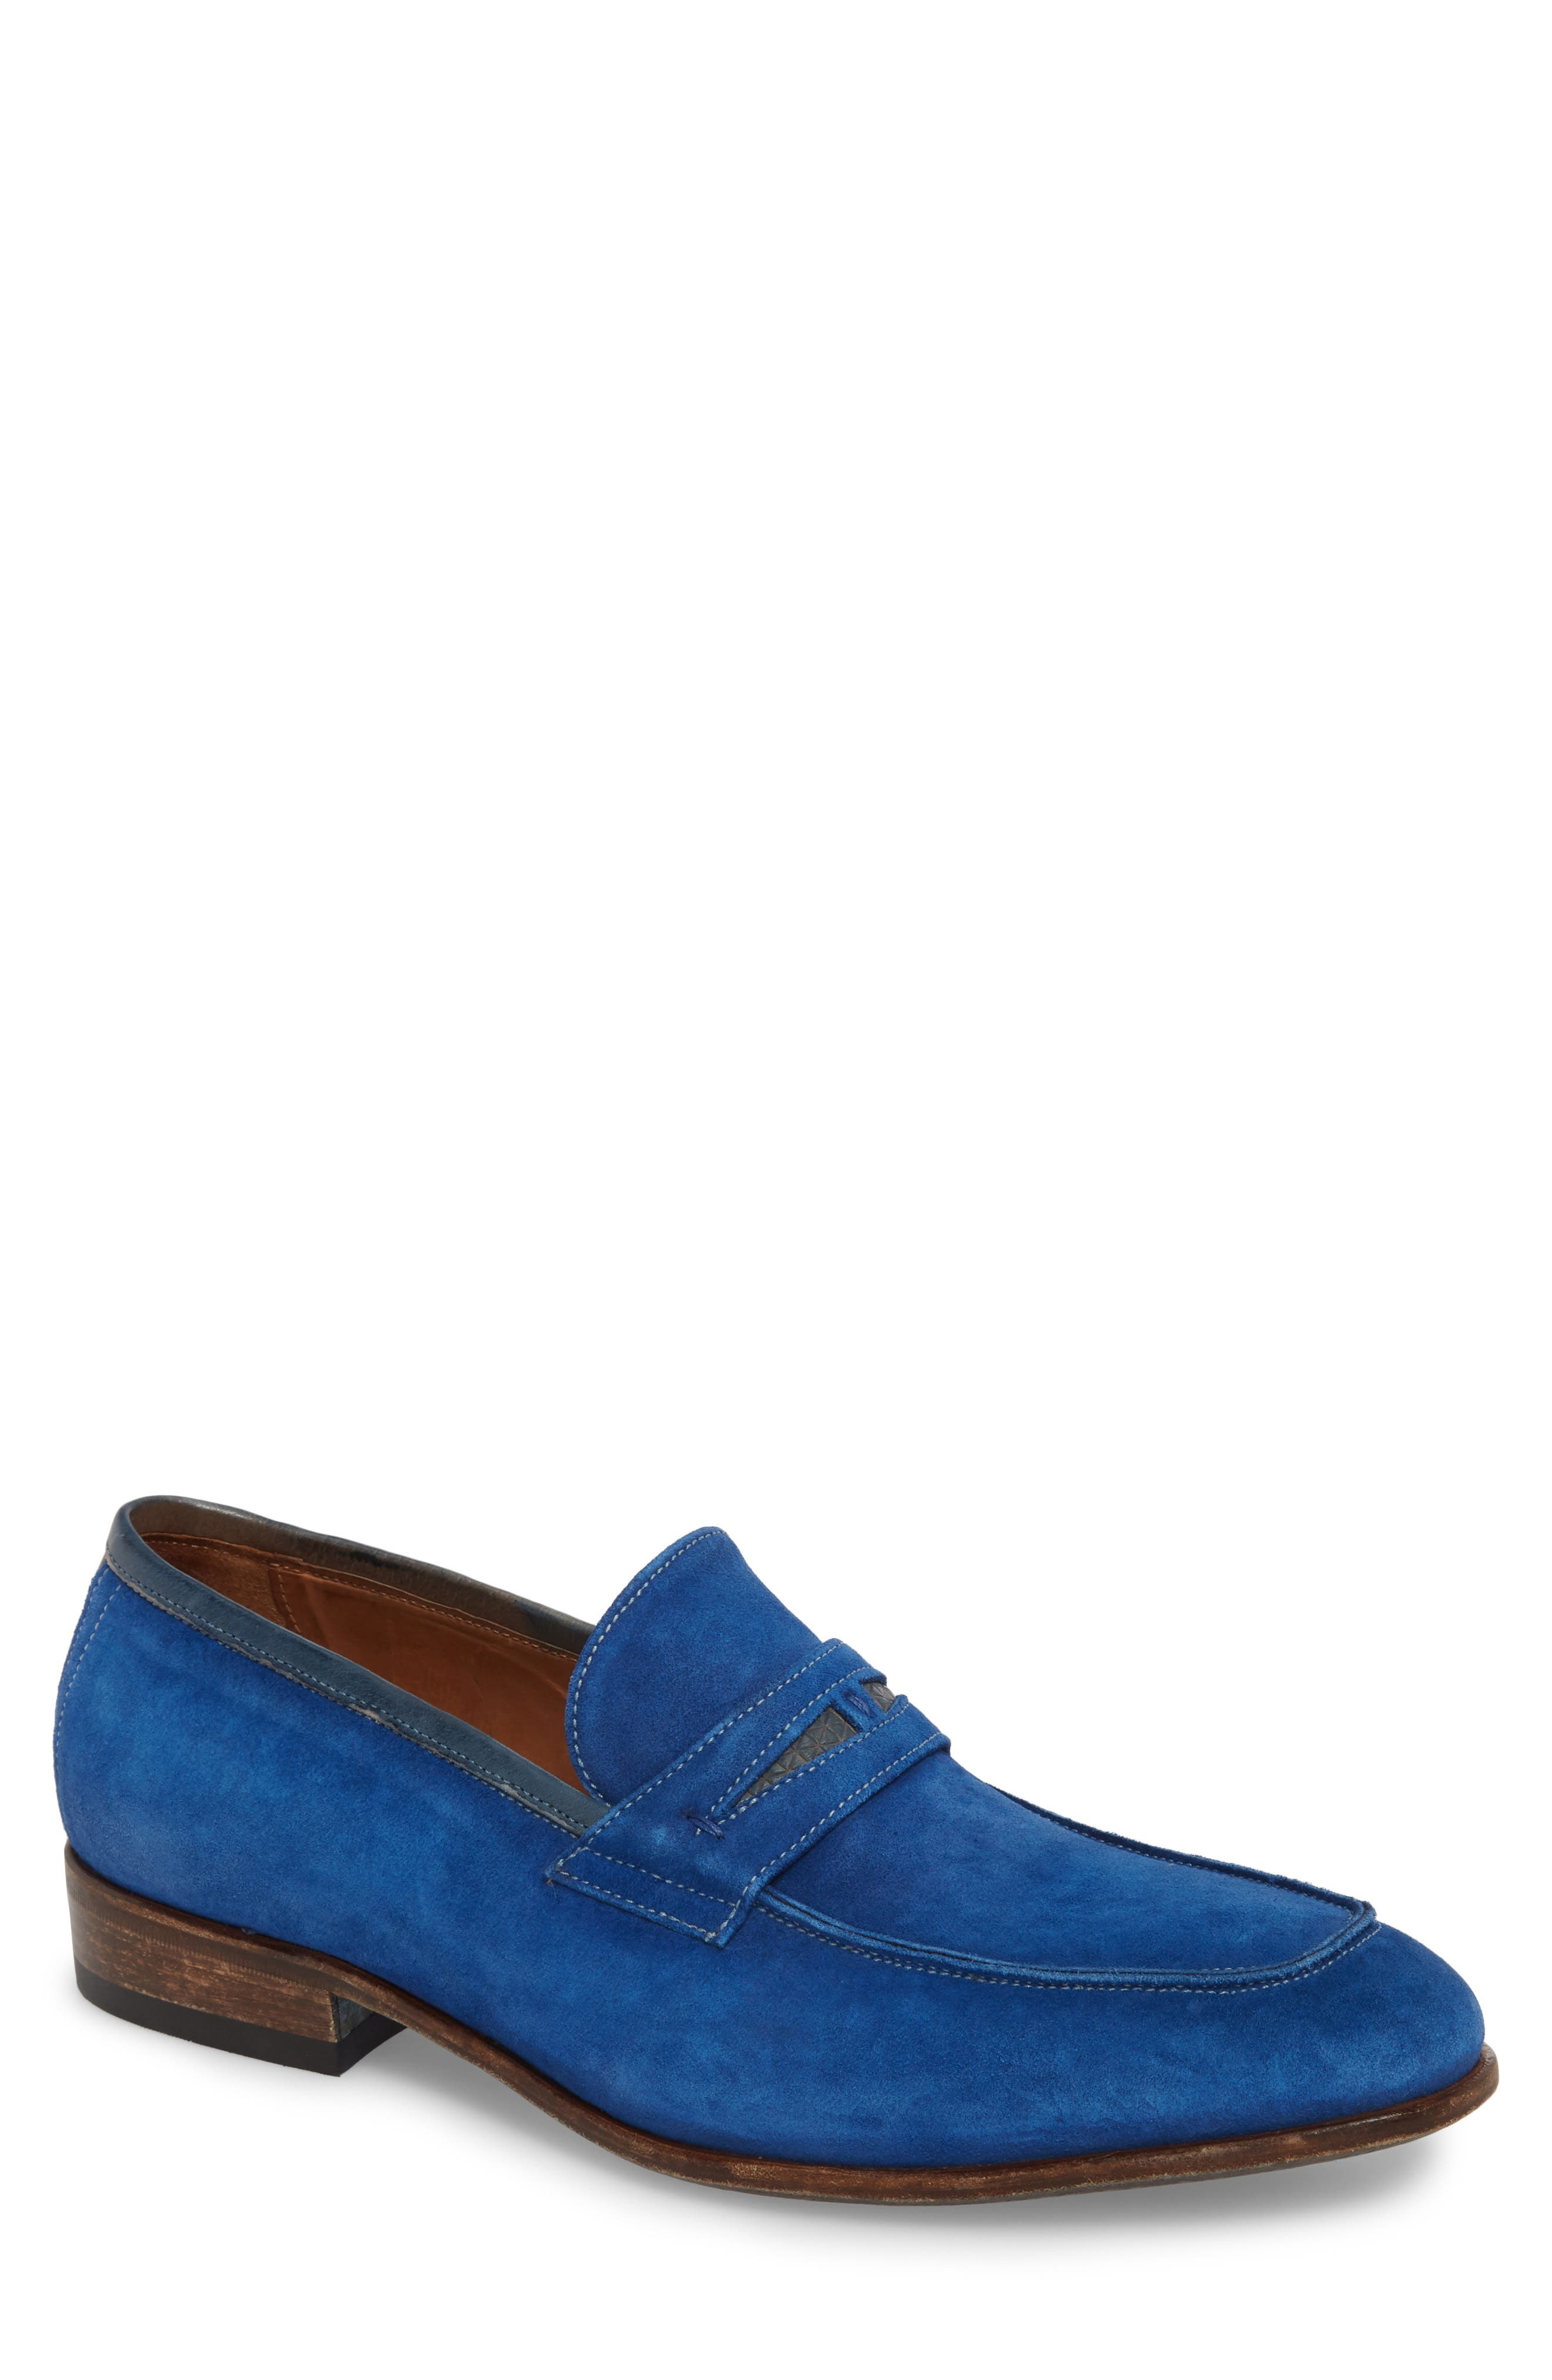 Lex Apron Toe Penny Loafer,                             Main thumbnail 1, color,                             Blue Suede